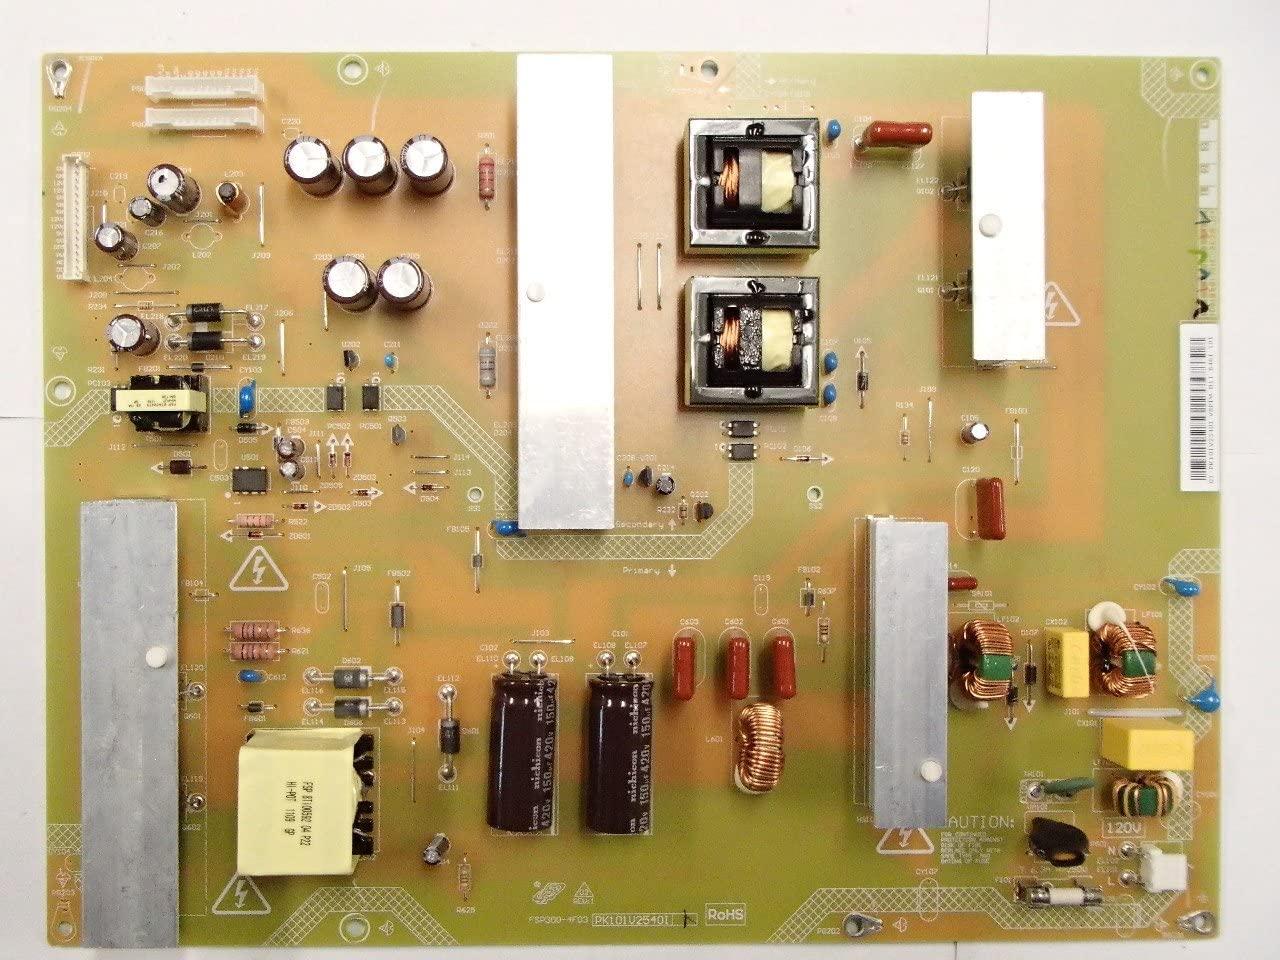 55 DP55441 PK101V2540I LCD Power Supply Board Unit Motherboard